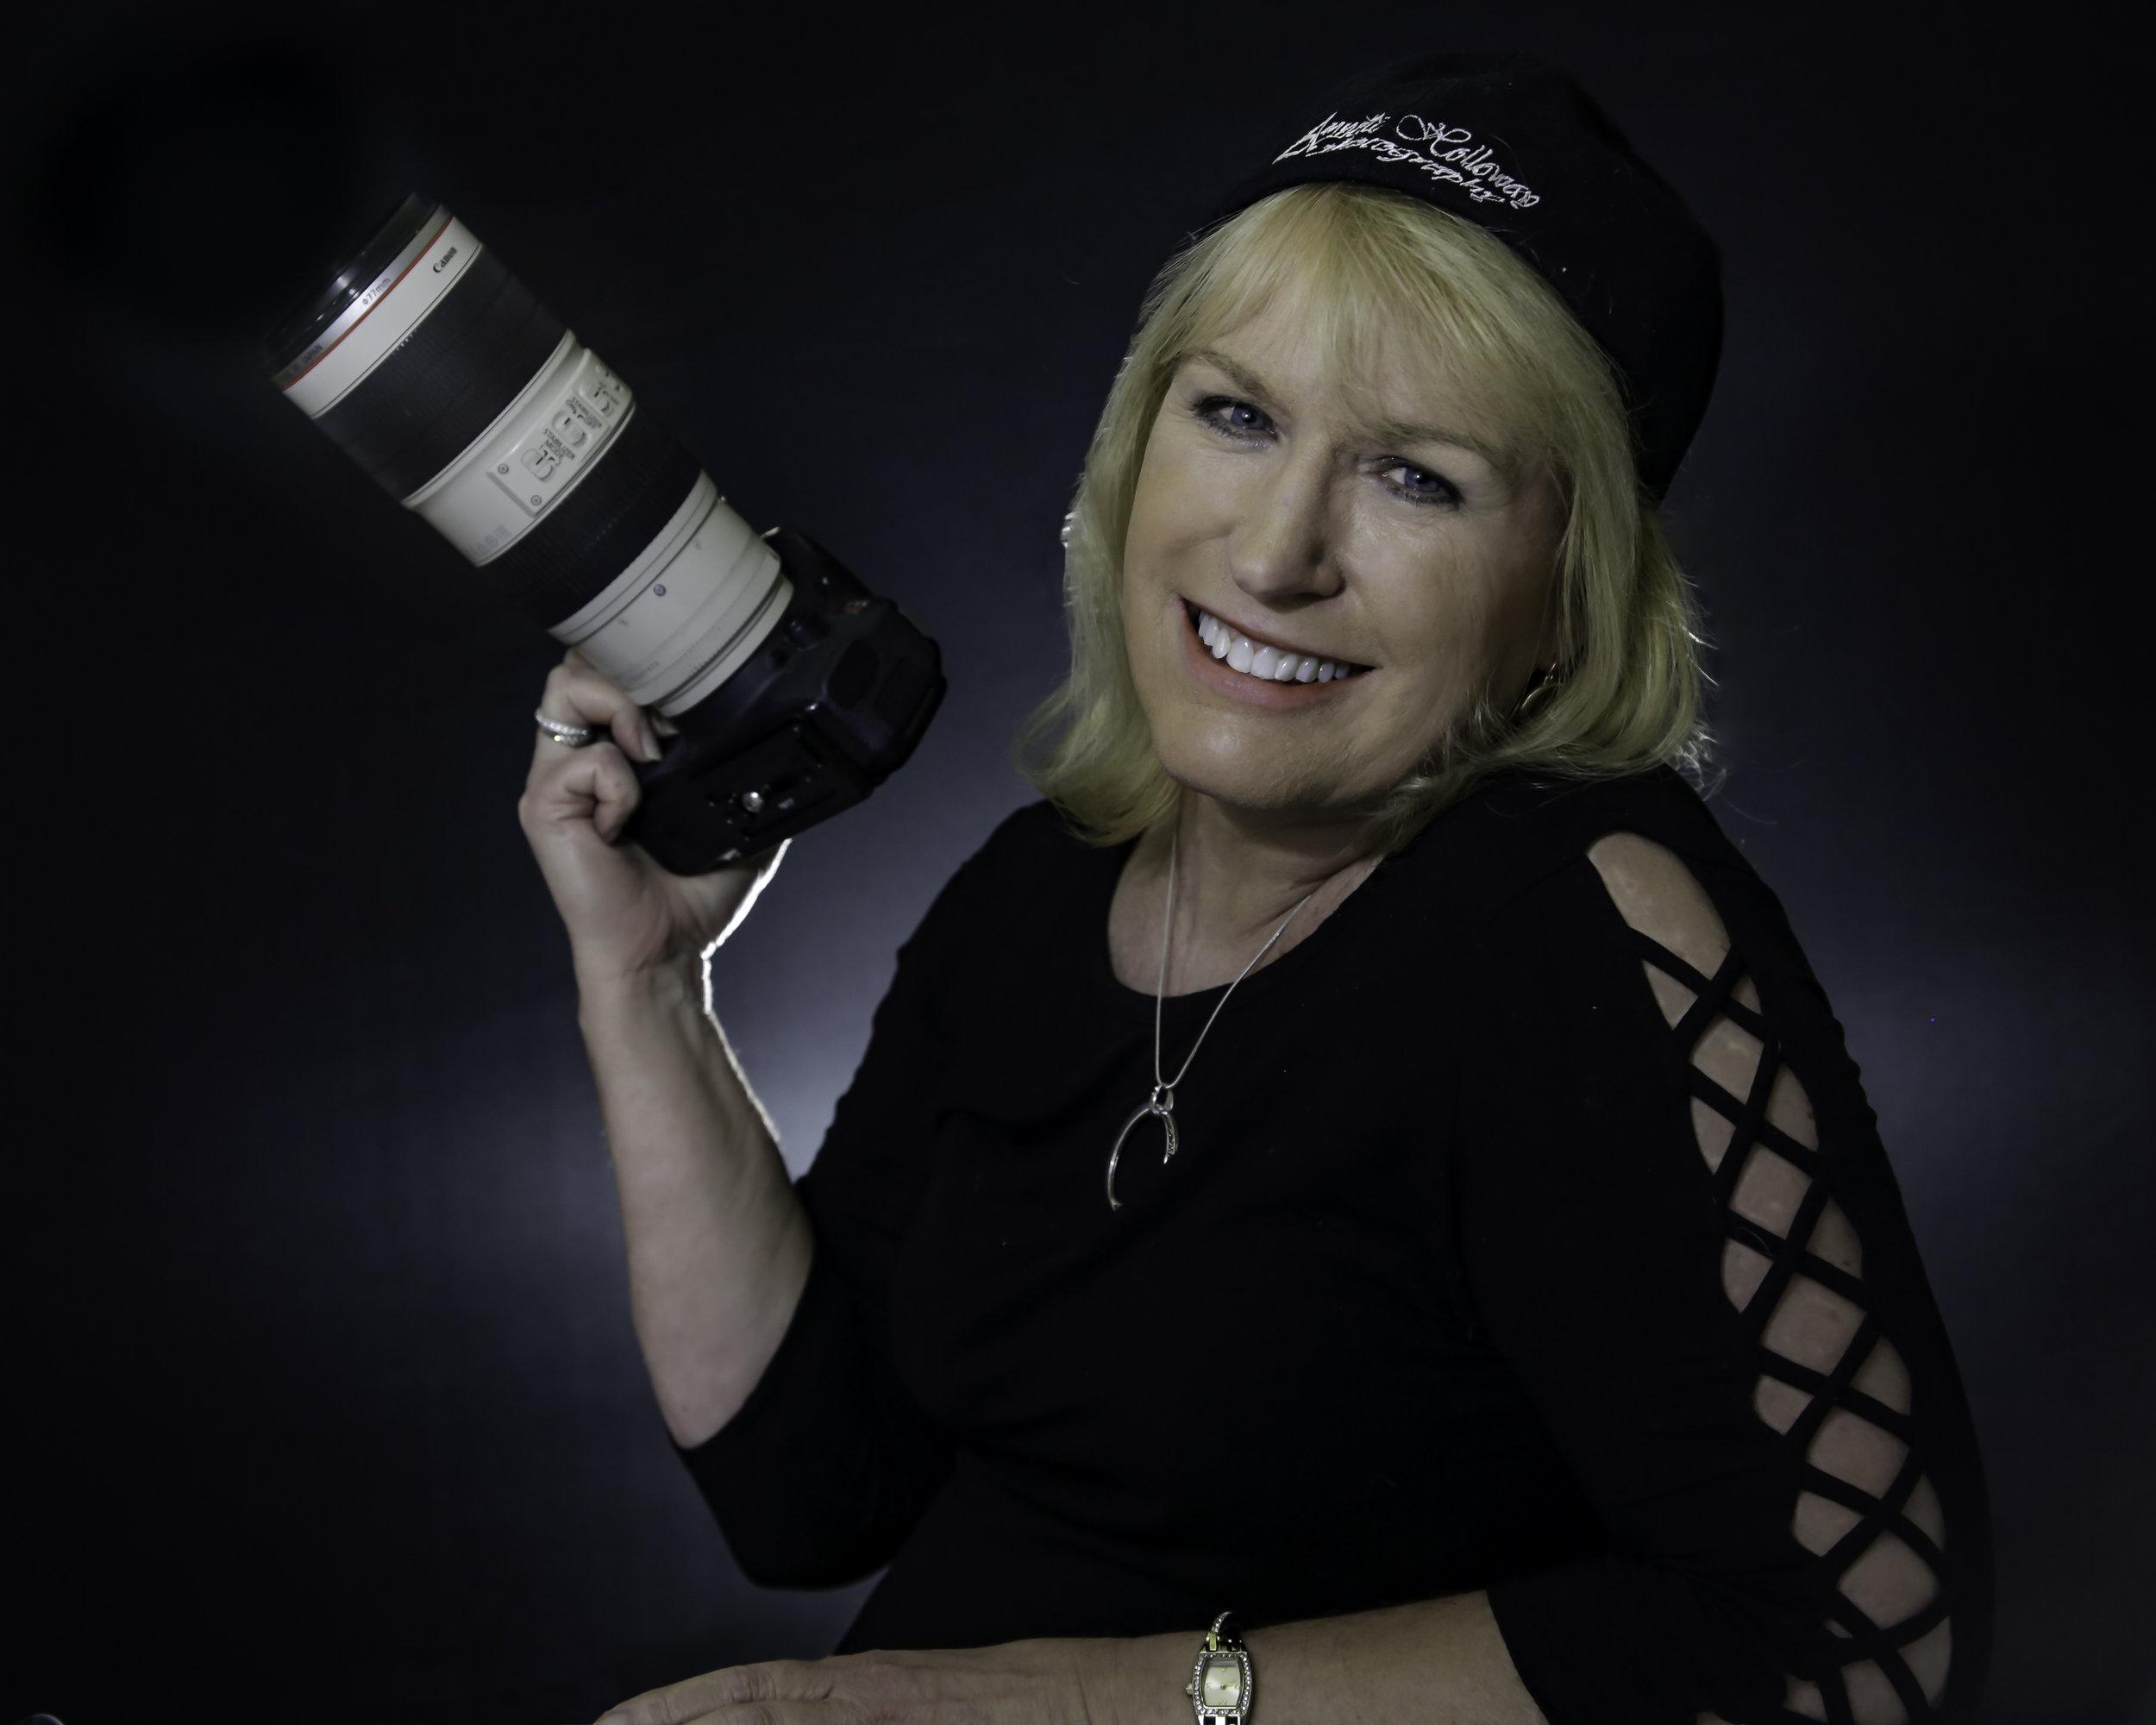 Annette Holloway